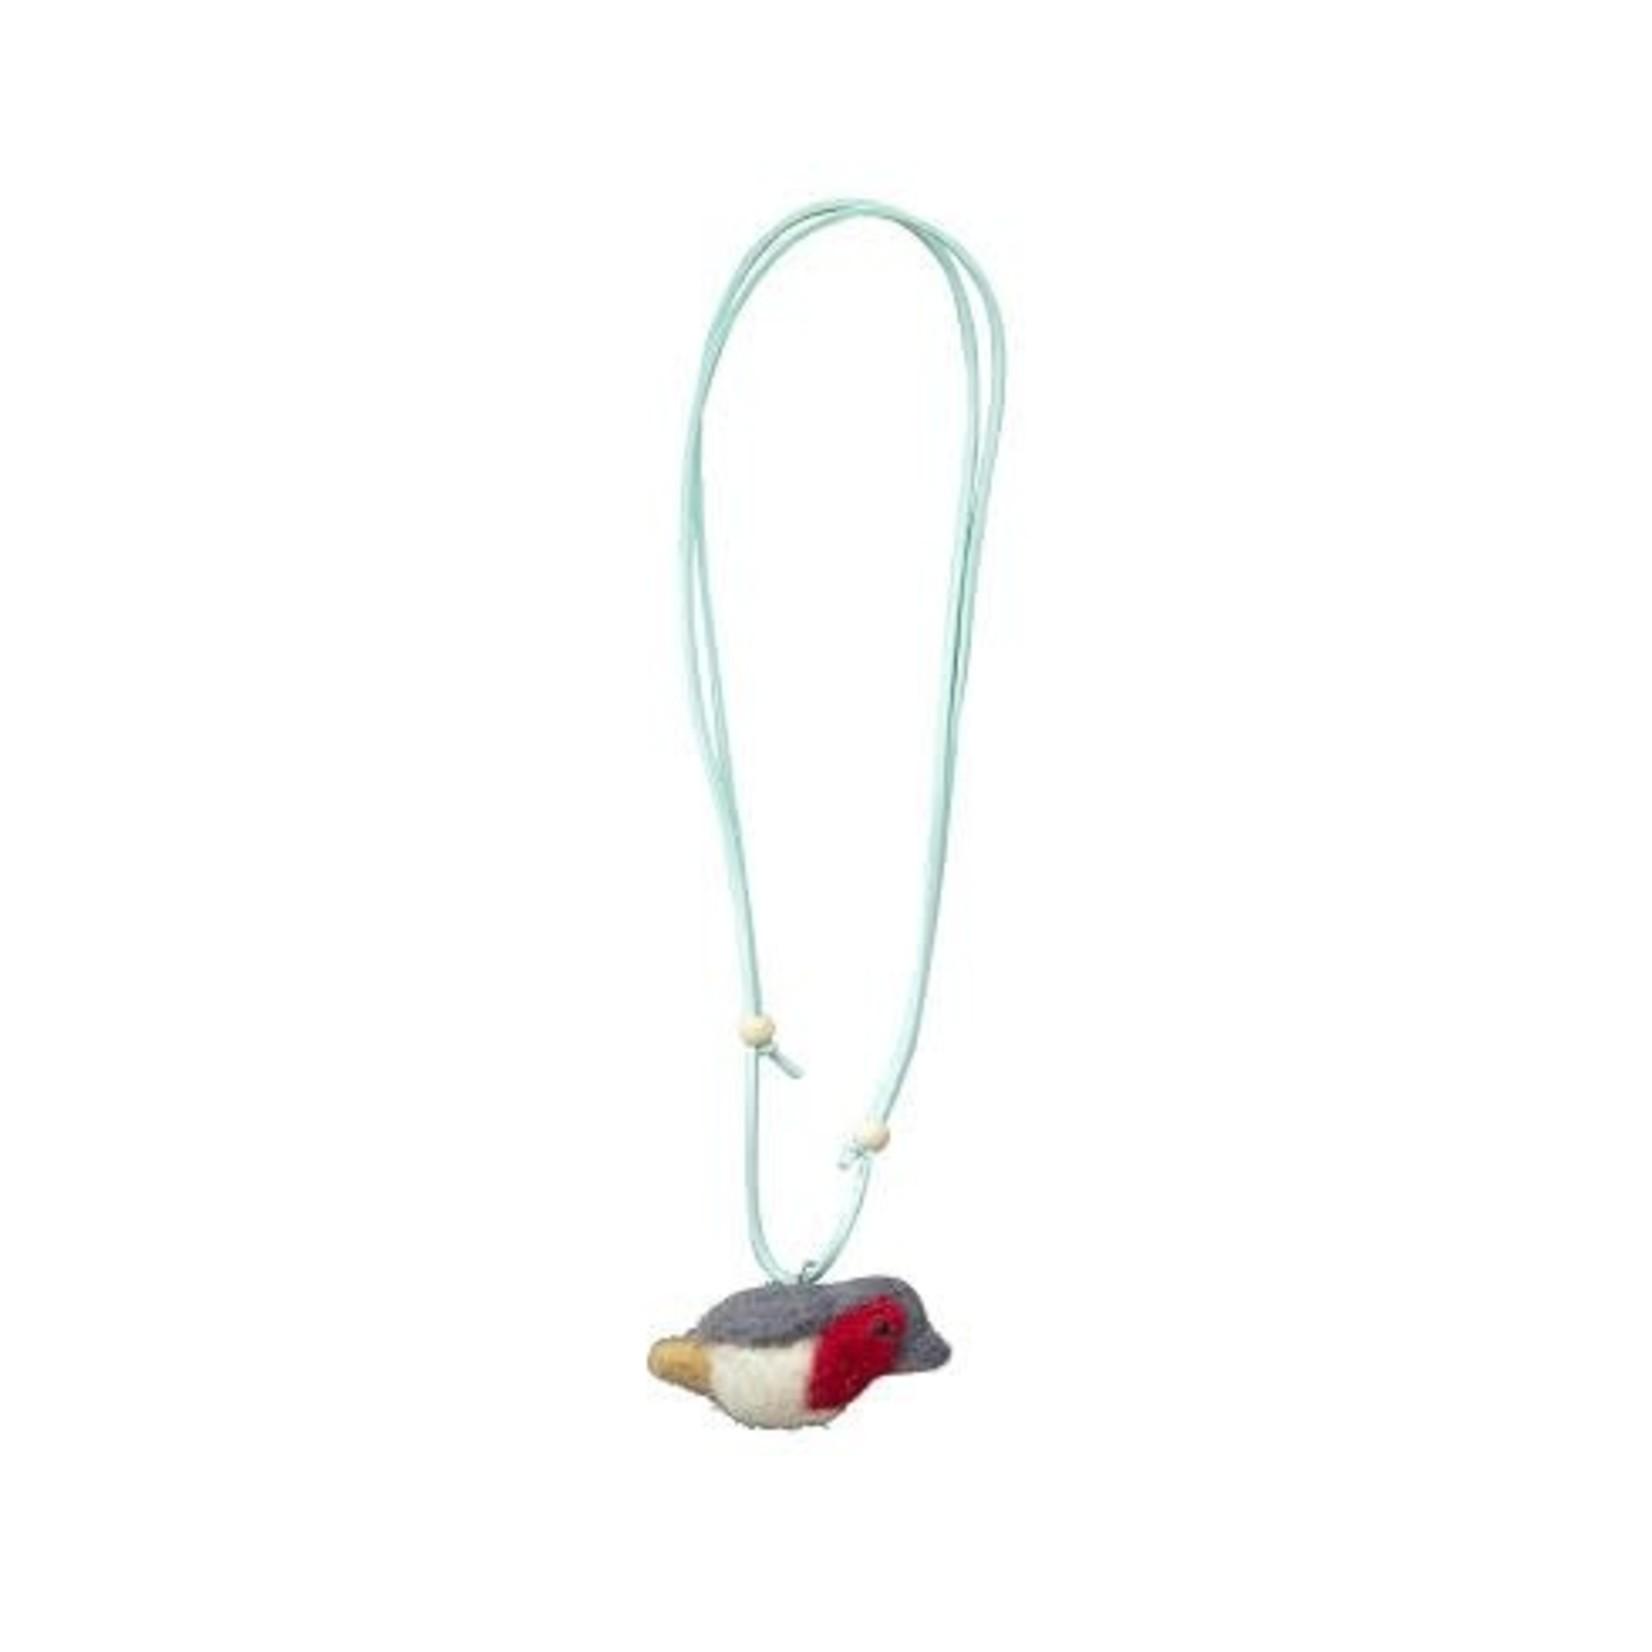 GLOBAL AFFAIRS GLOBAL AFFAIRS necklace robin